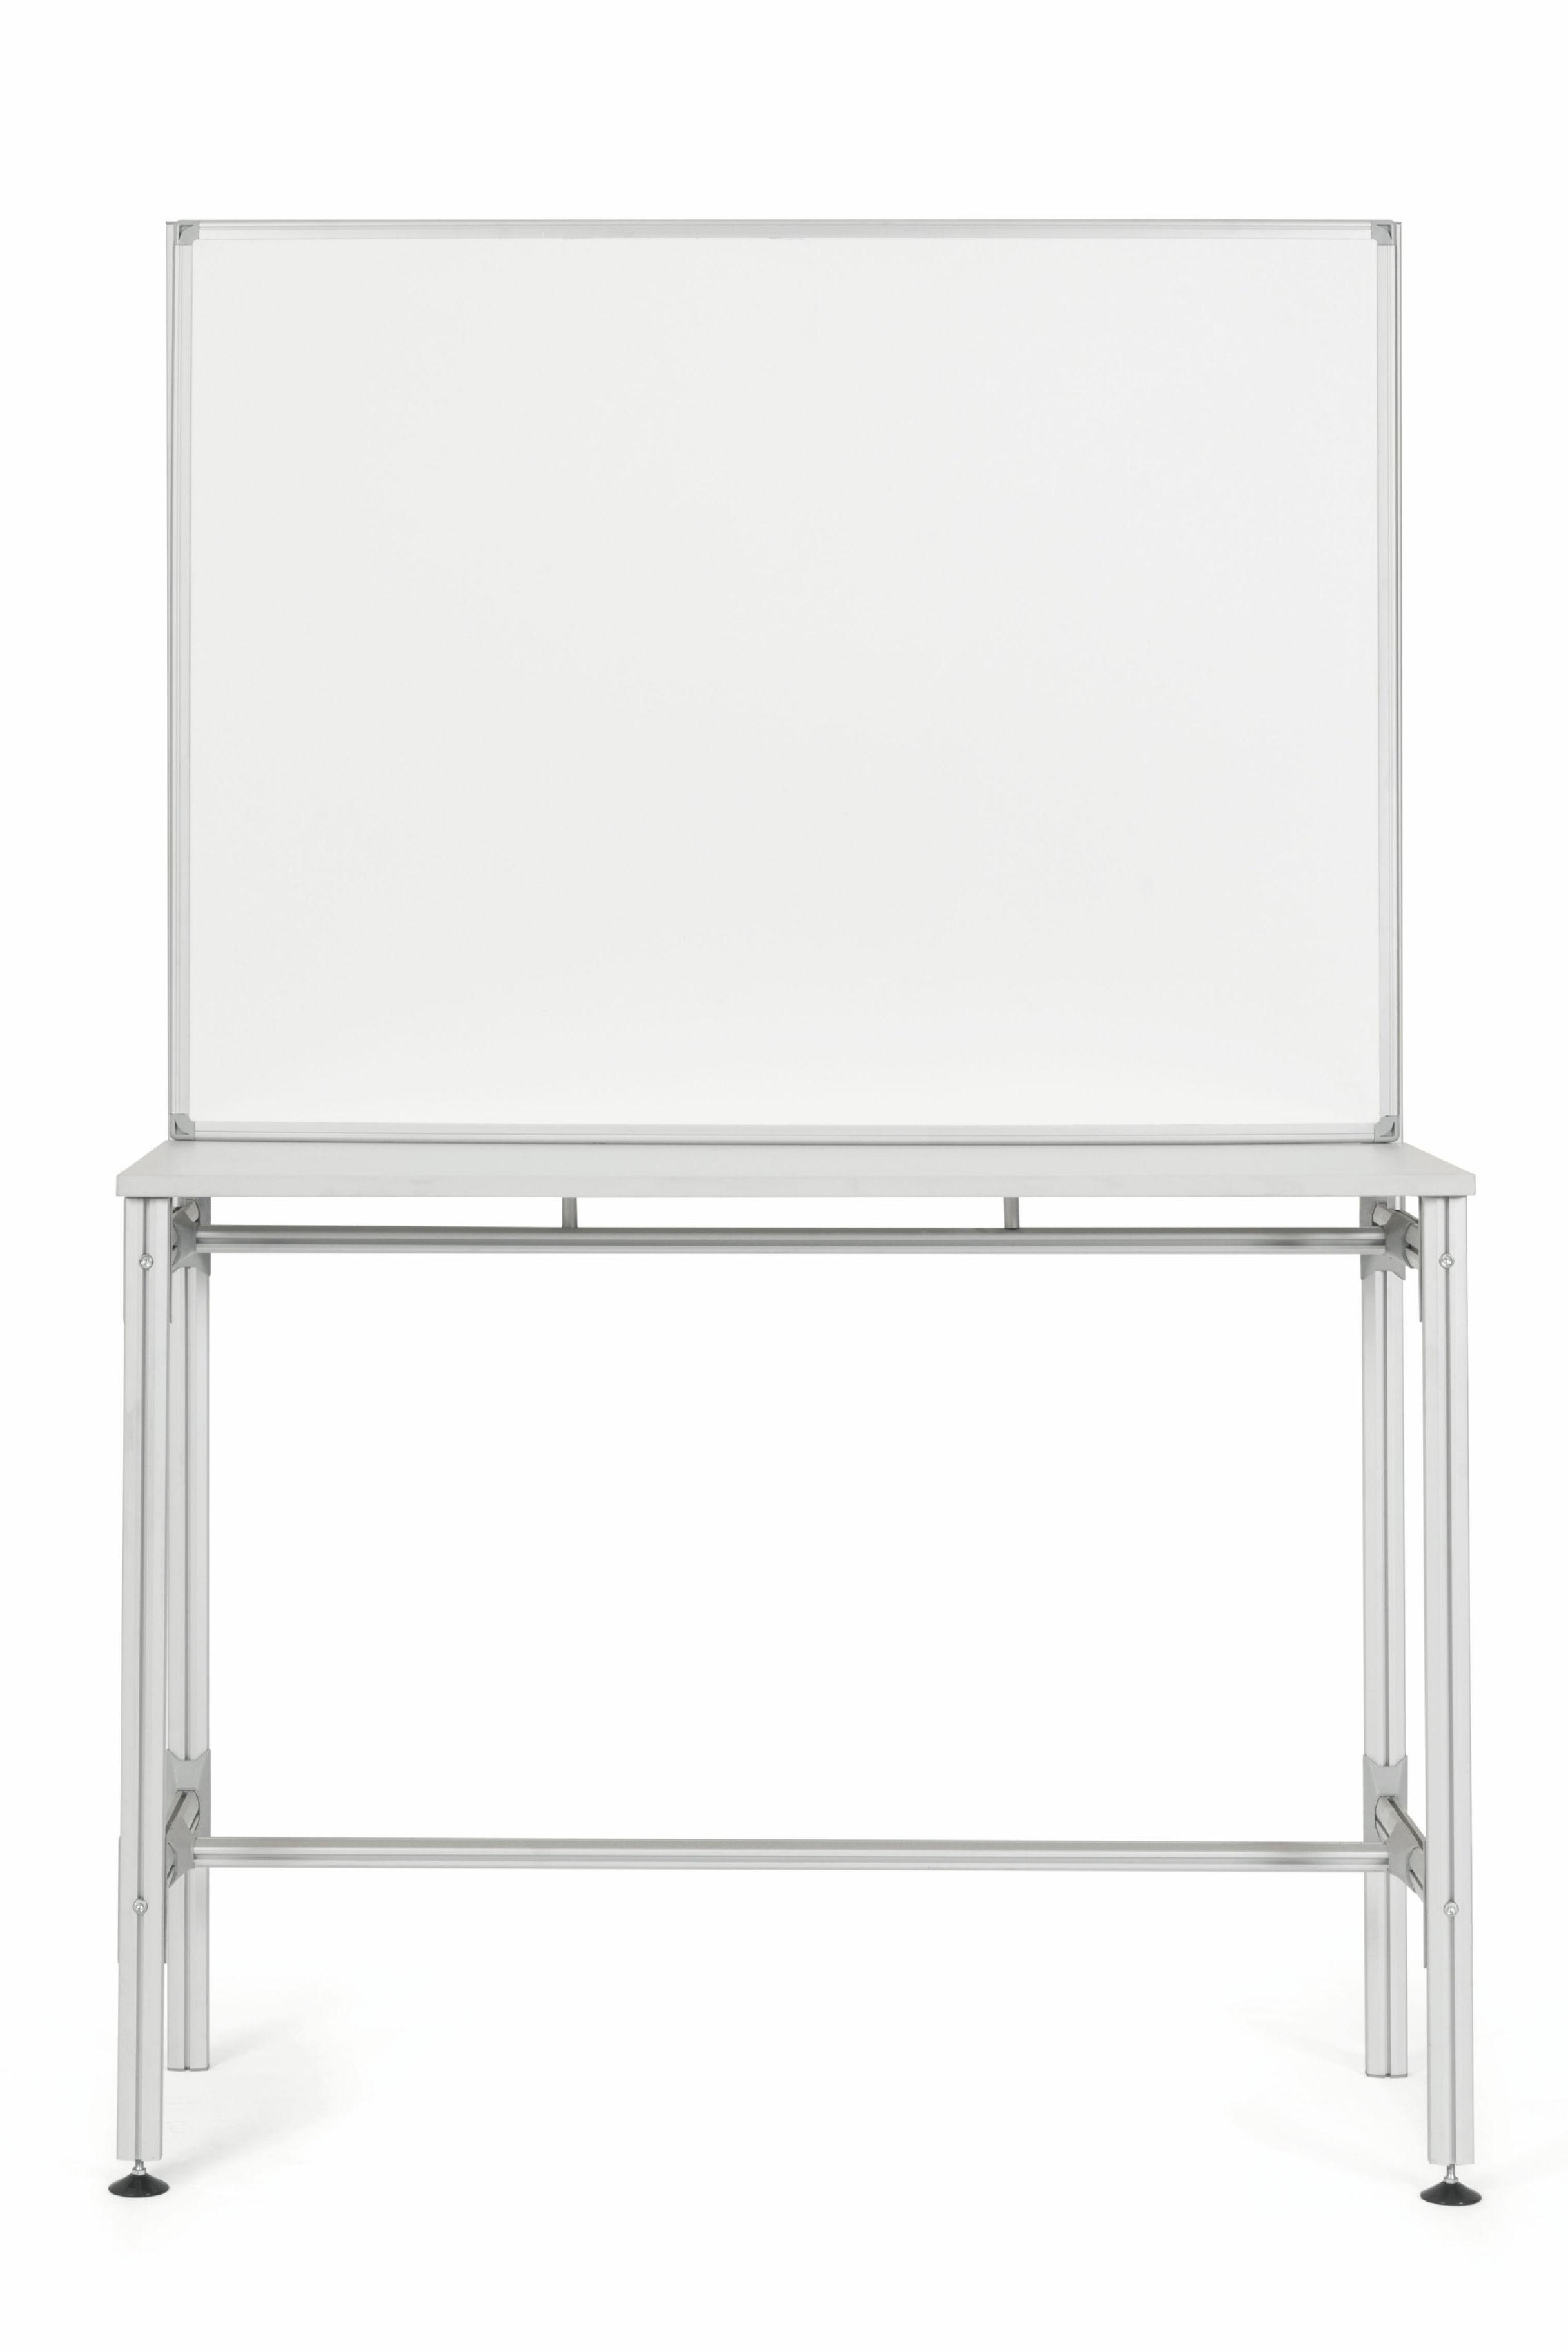 Desk Mats Bi Office Desk Mat With Magnetic Board 120 x 90